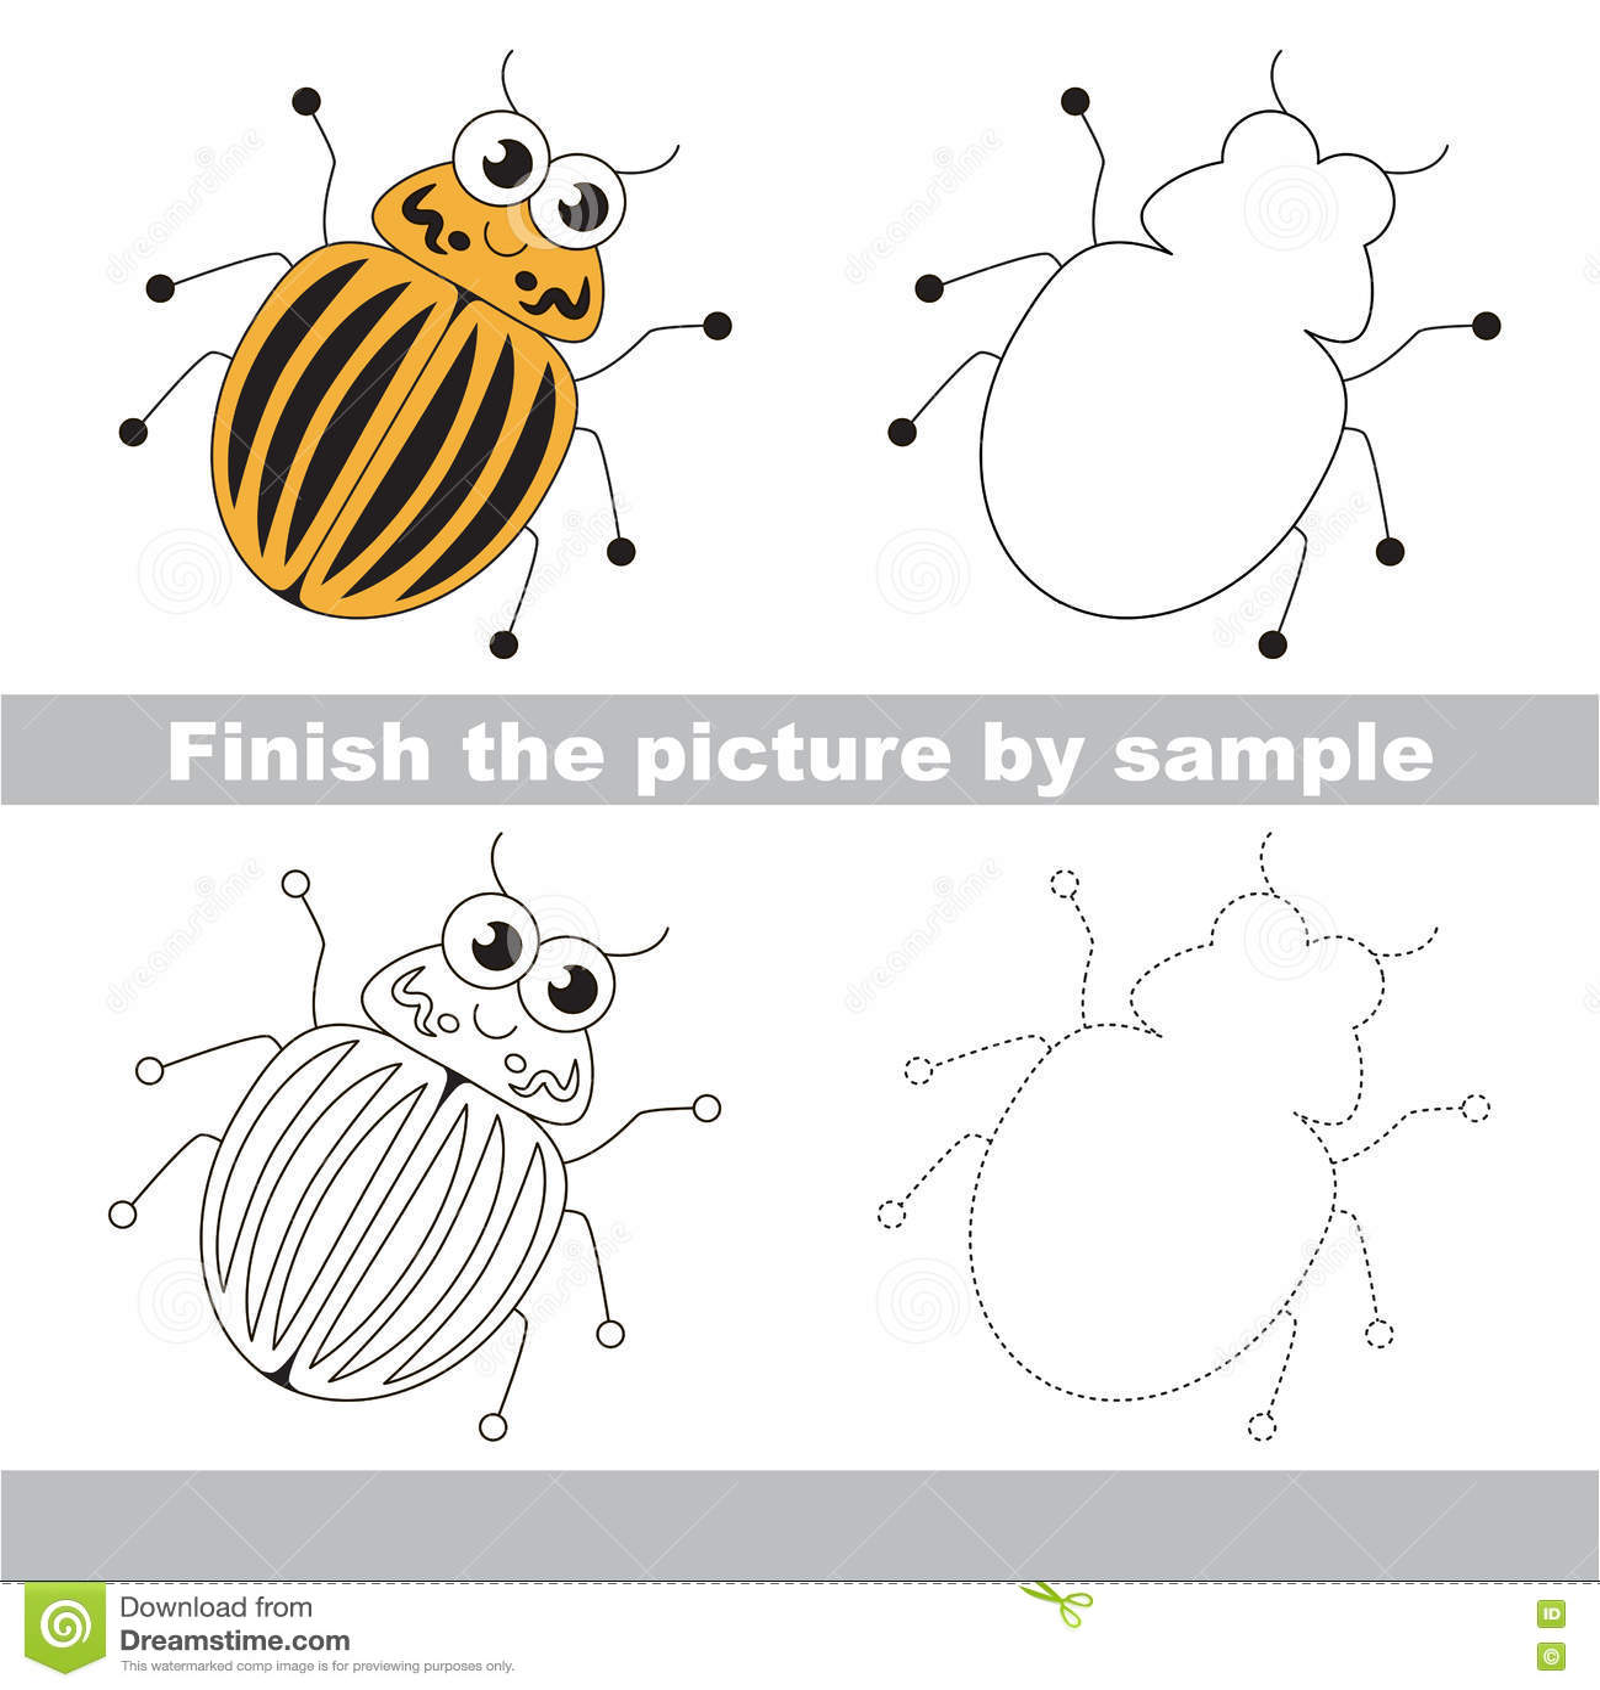 Colorado Potato Beetle Drawing Worksheet Vector Image – Child Support Worksheet Colorado